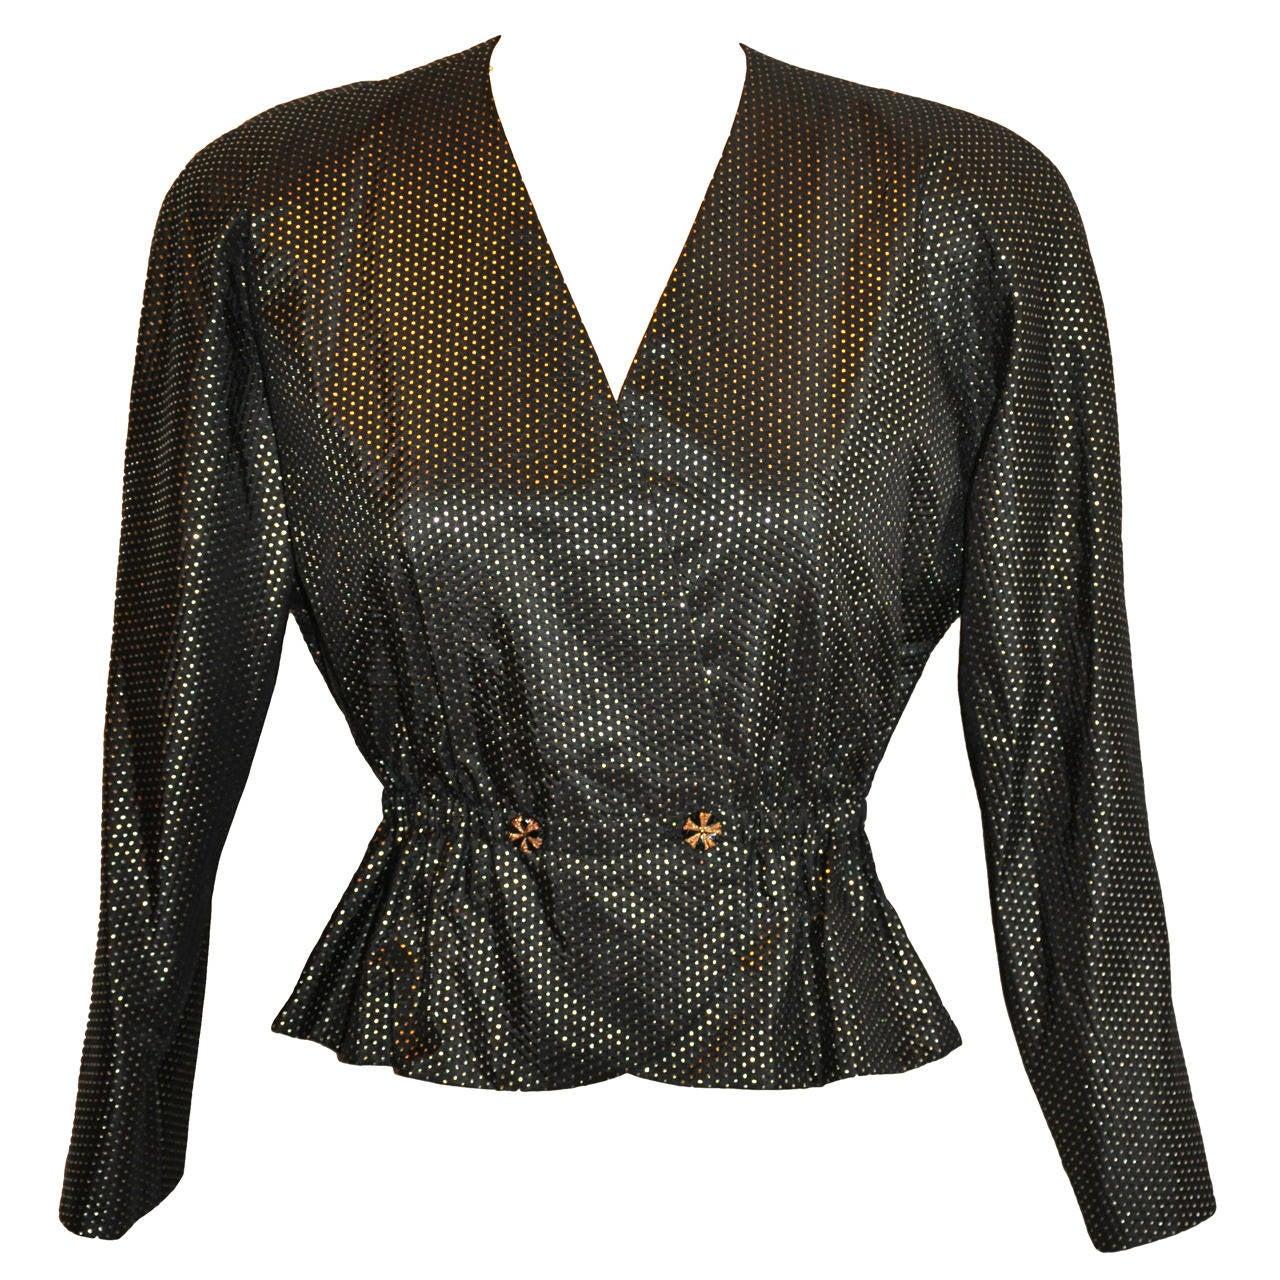 Halston Black with Metallic Gold Polka Dot Silk Evening Jacket